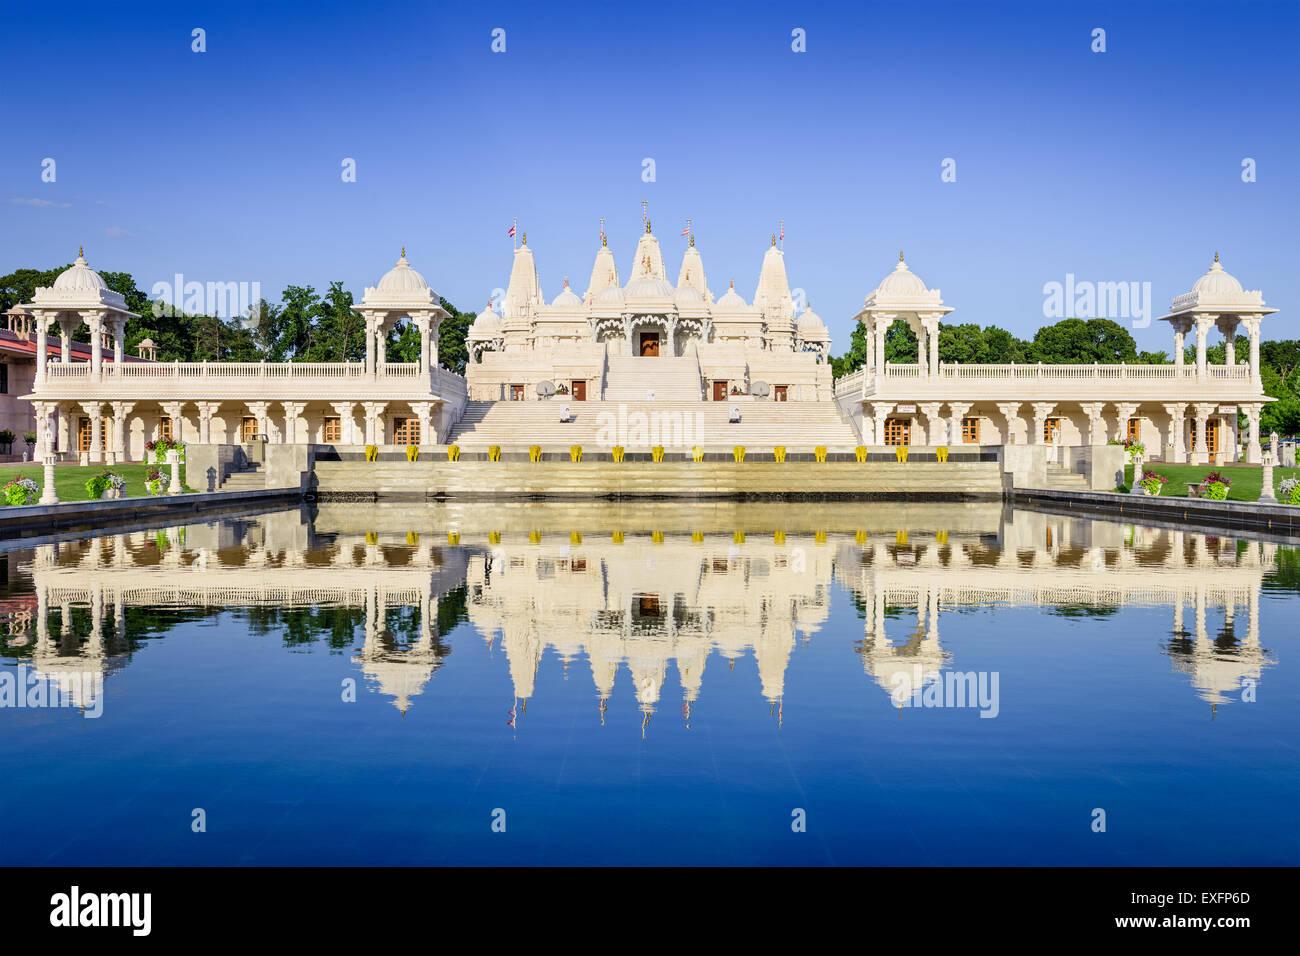 Templo hindú en Atlanta, Georgia. Imagen De Stock